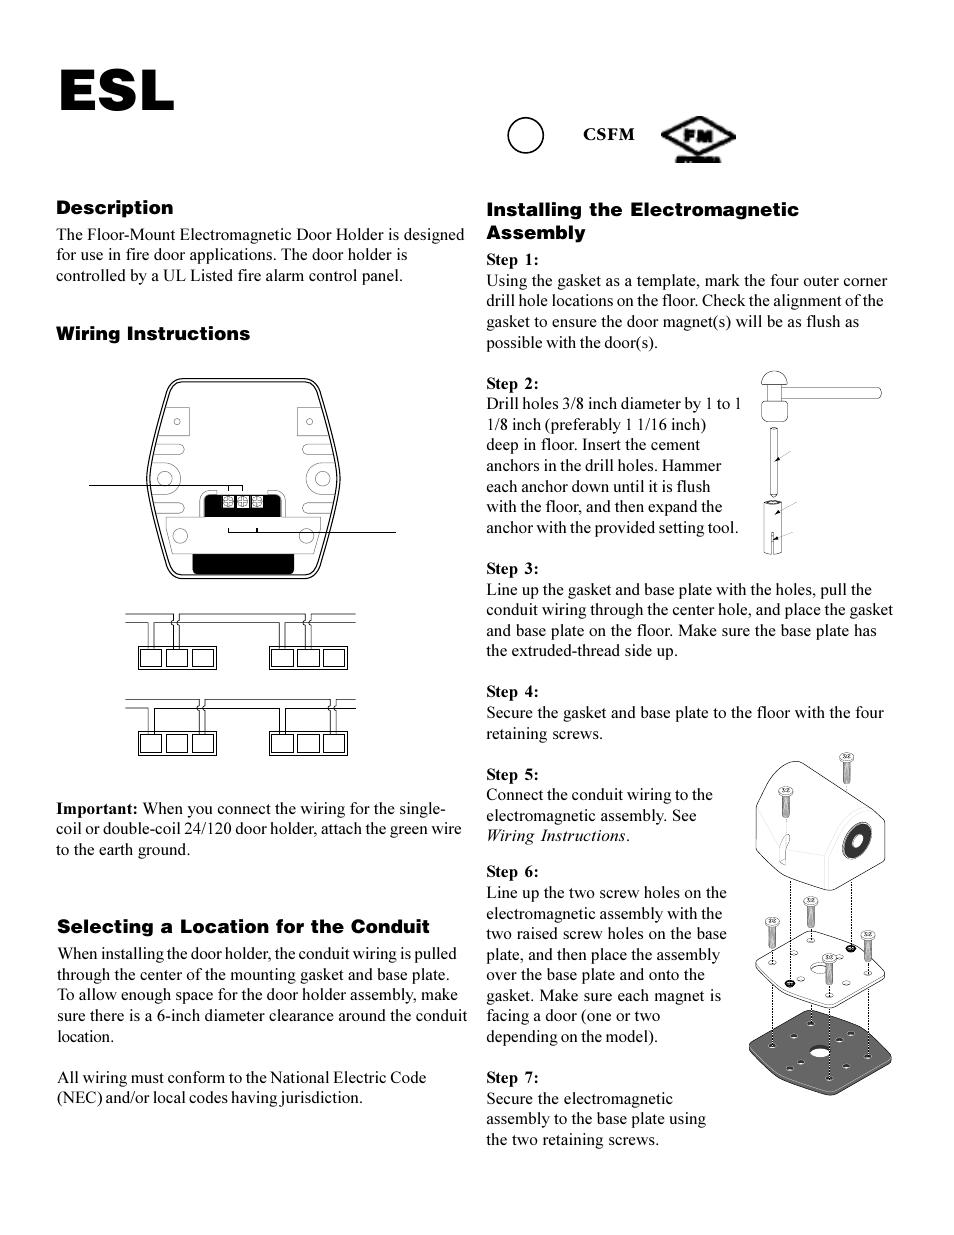 Interlogix Esl Dh Series User Manual 4 Pages